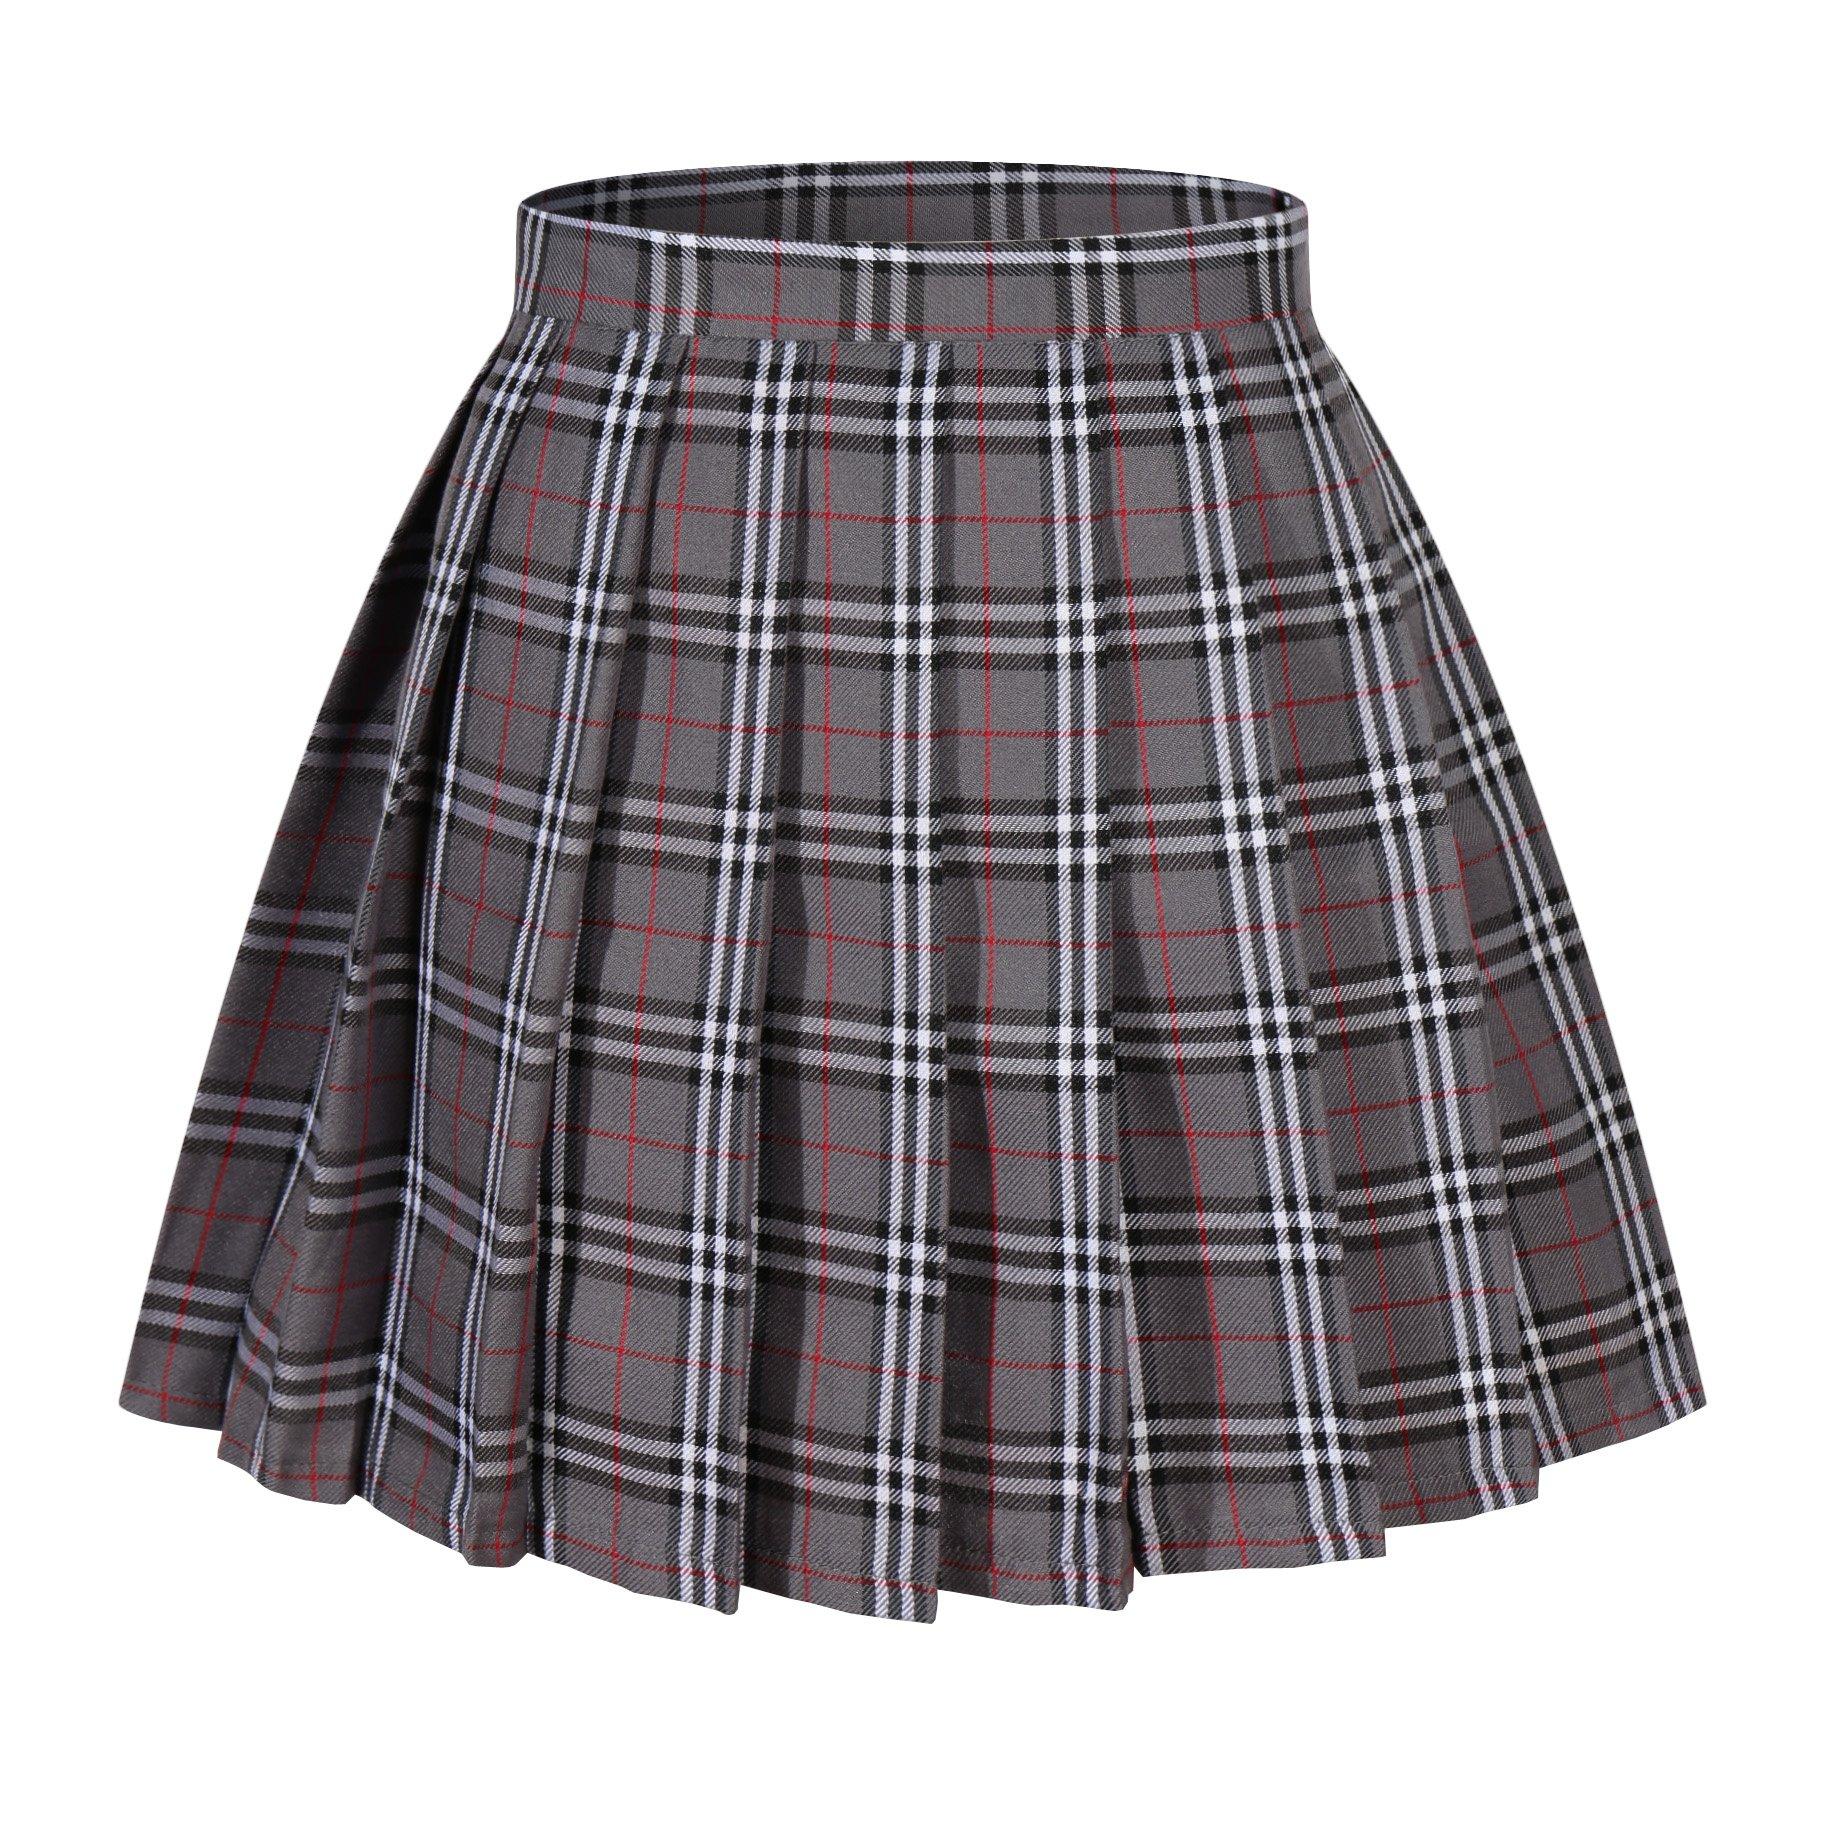 Beautifulfashionlife Girl's A-Line Kilt Plaid Pleated Skirts (XS, Grey Mixed White)